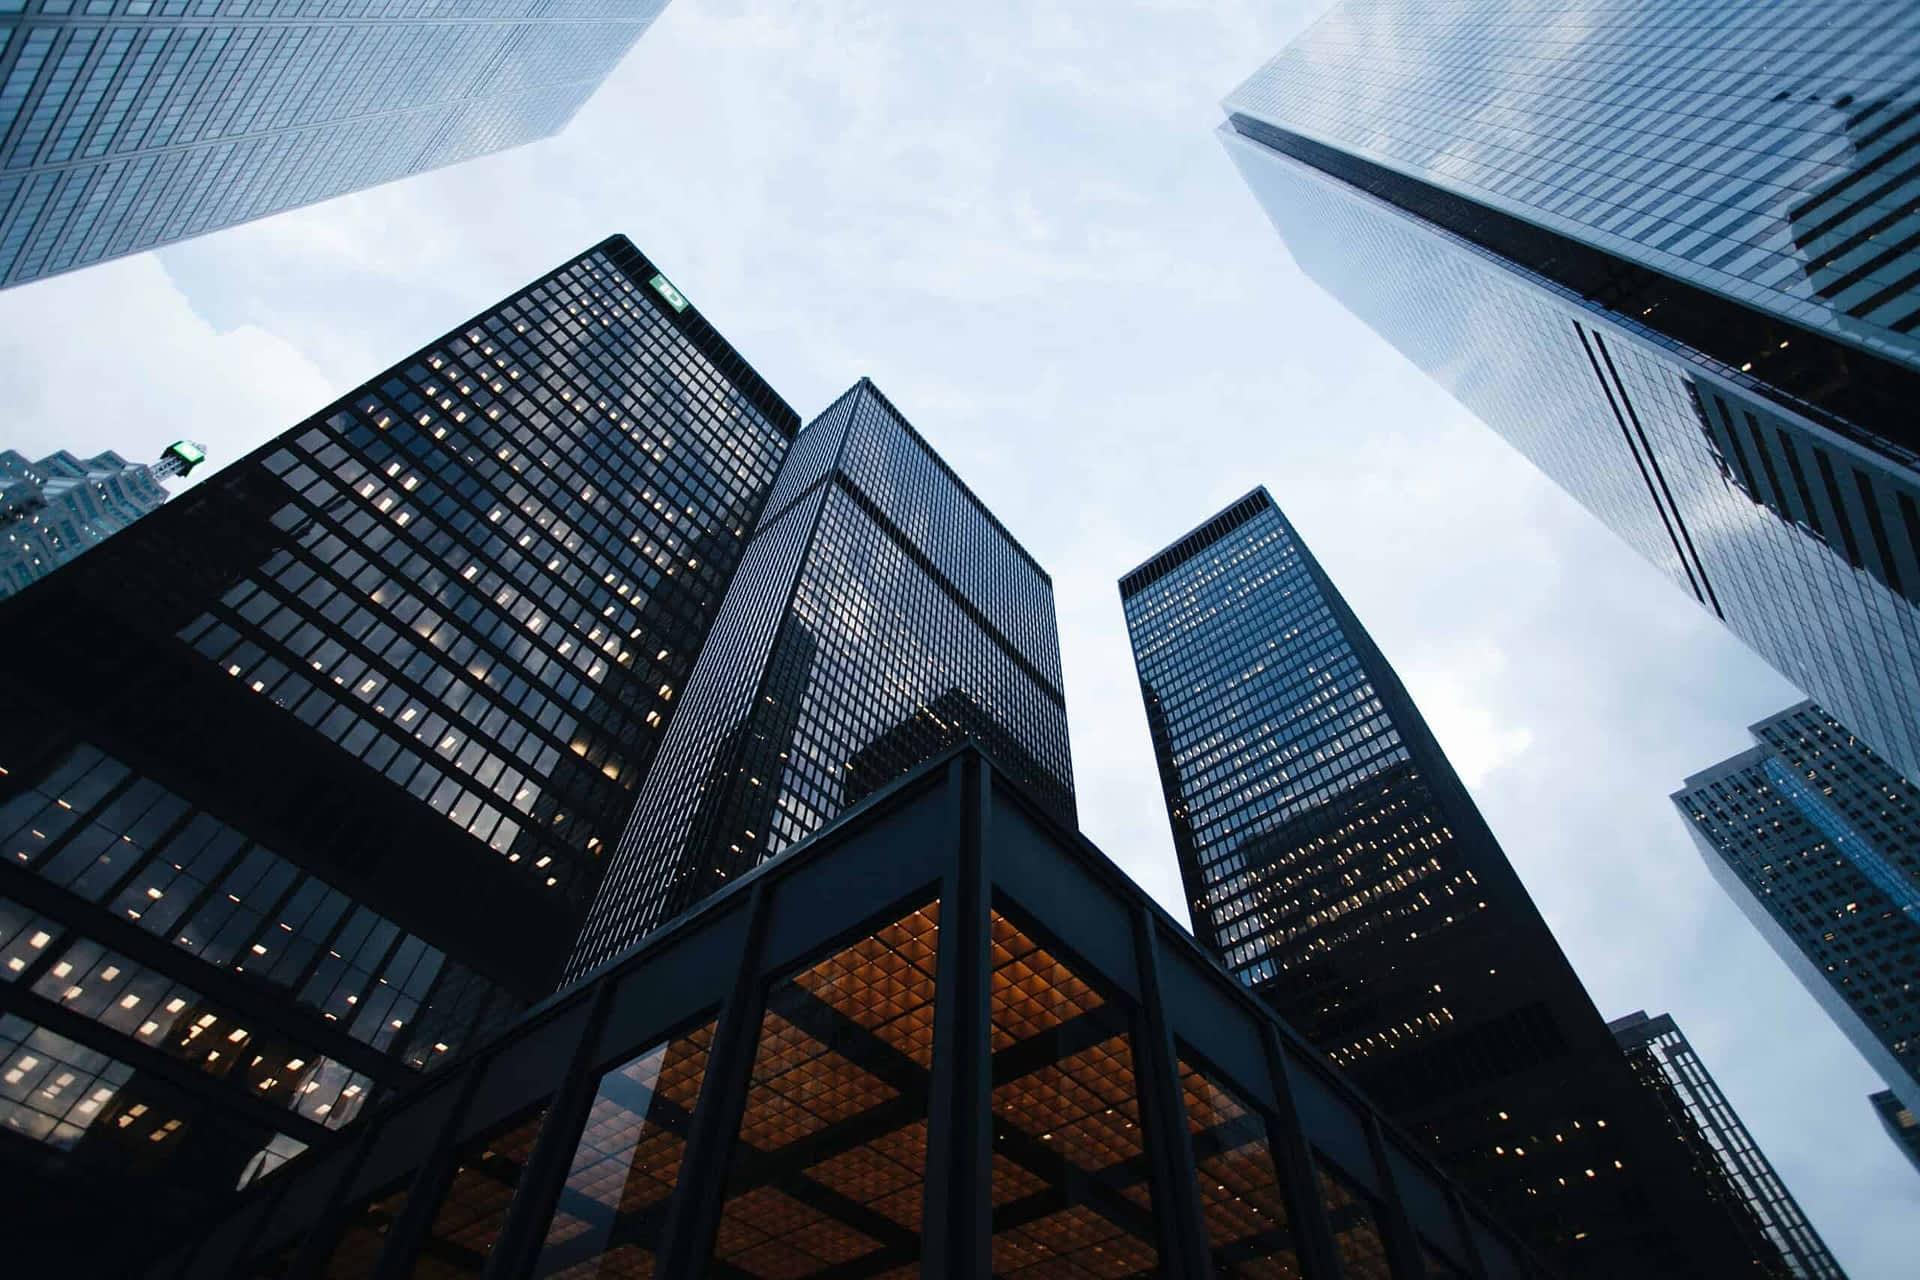 AlphaSense Raises $180 Million Series C Led by Viking Global and Goldman Sachs, Joined by Morgan Stanley, Citi, Bank of America, Barclays, Wells Fargo, Cowen, AllianceBernstein